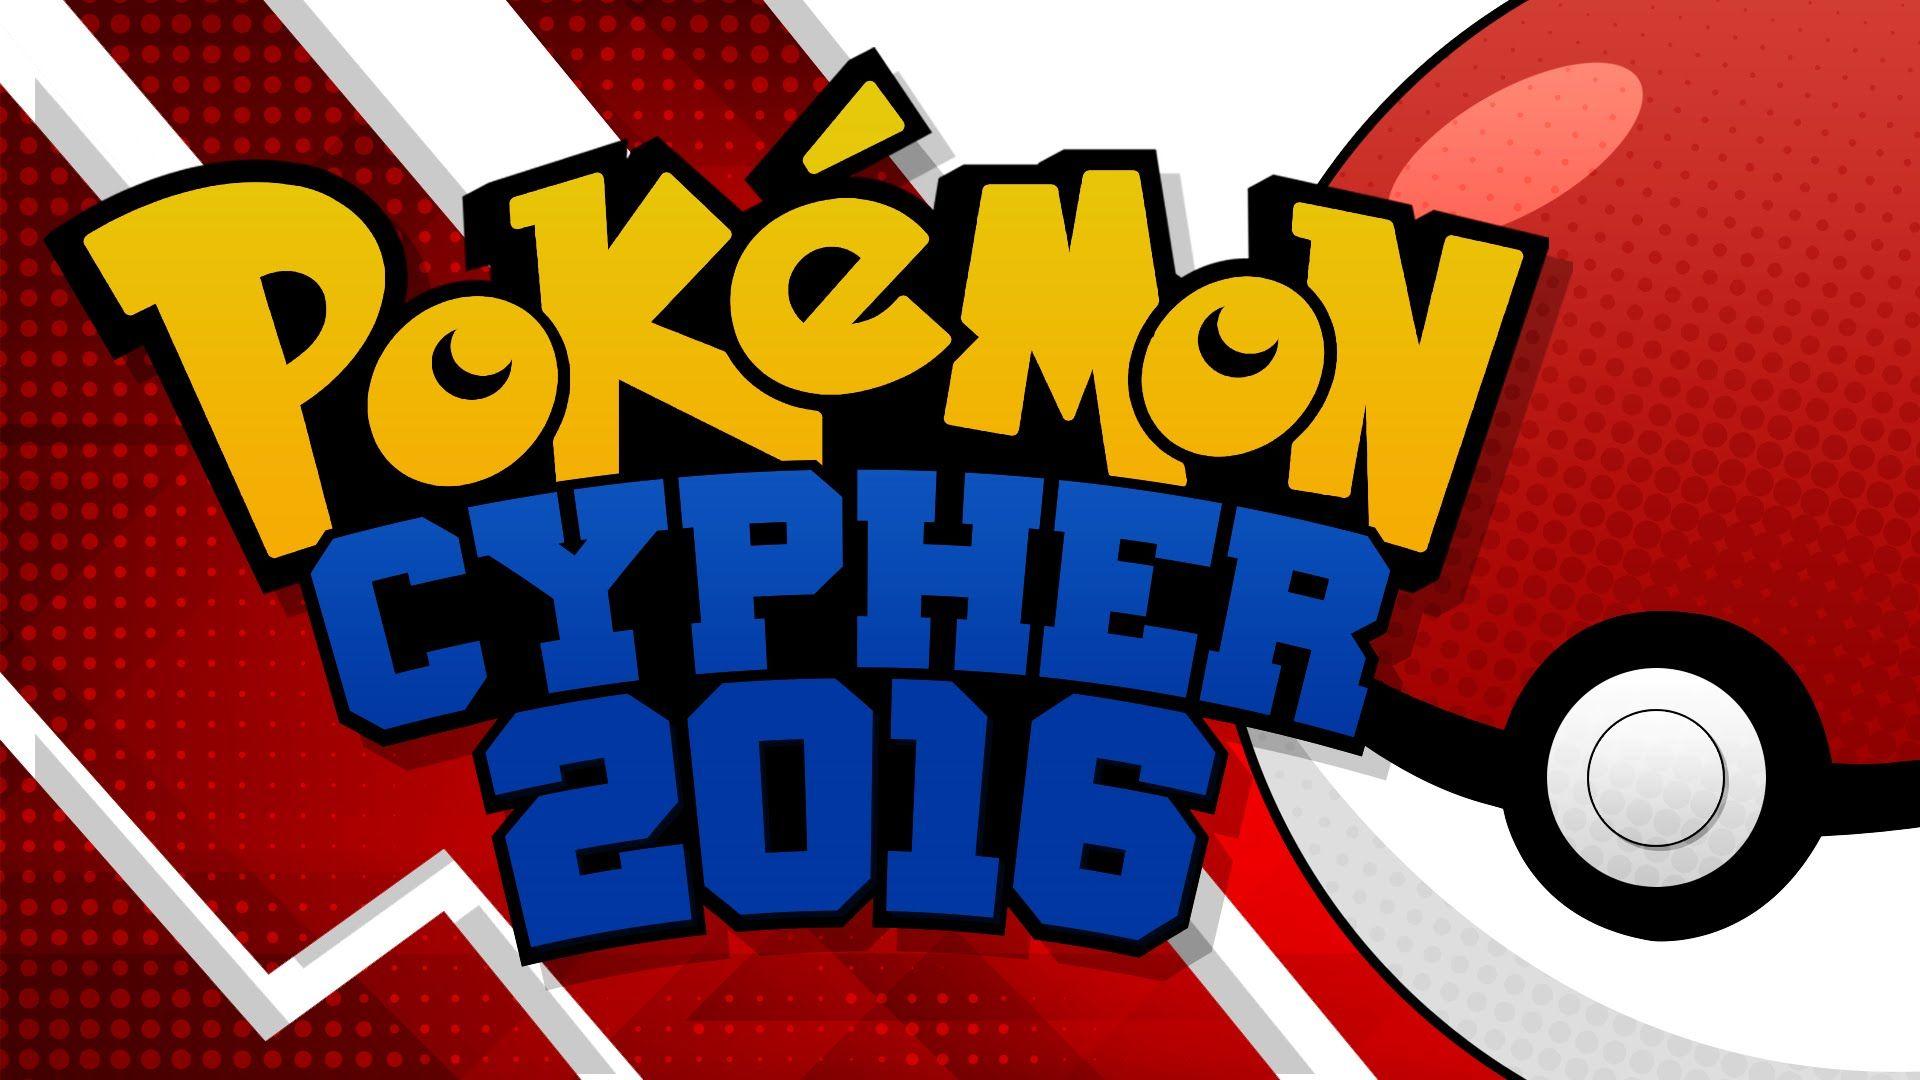 Pokémon Cypher 2016 by Shofu & co.